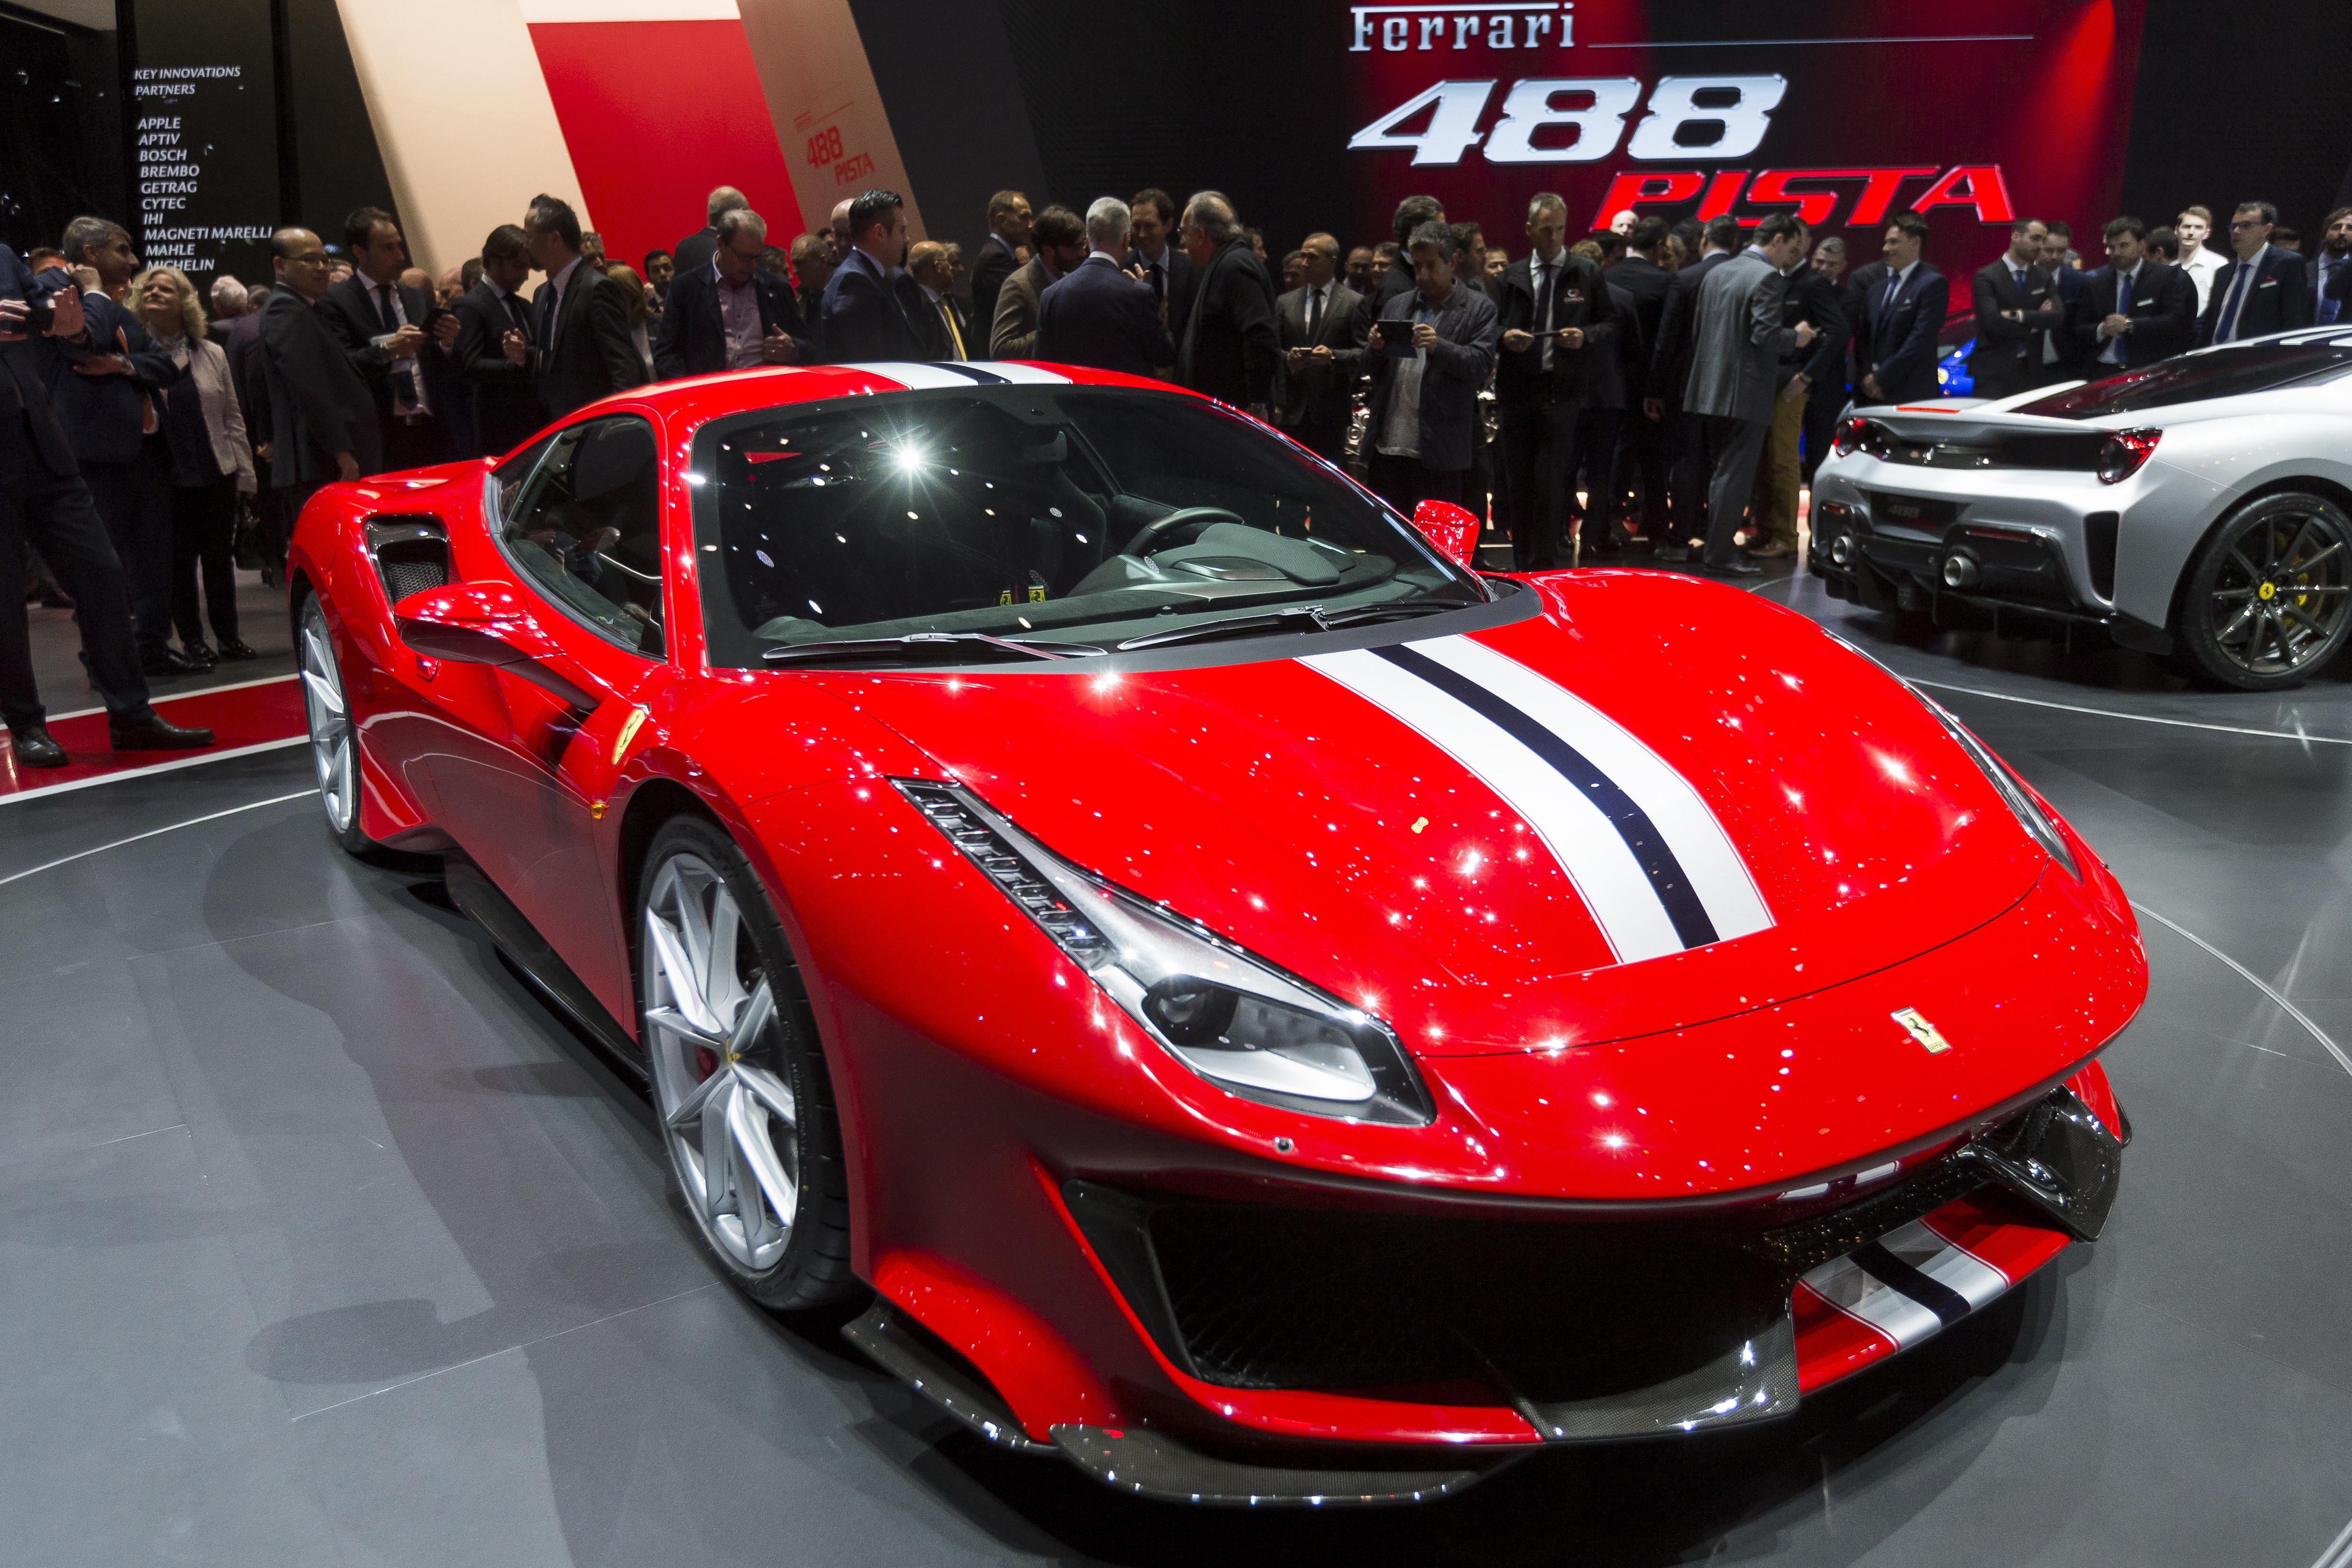 Discover Car Lot >> Electric cars: Ferrari is testing a hybrid supercar — Quartz